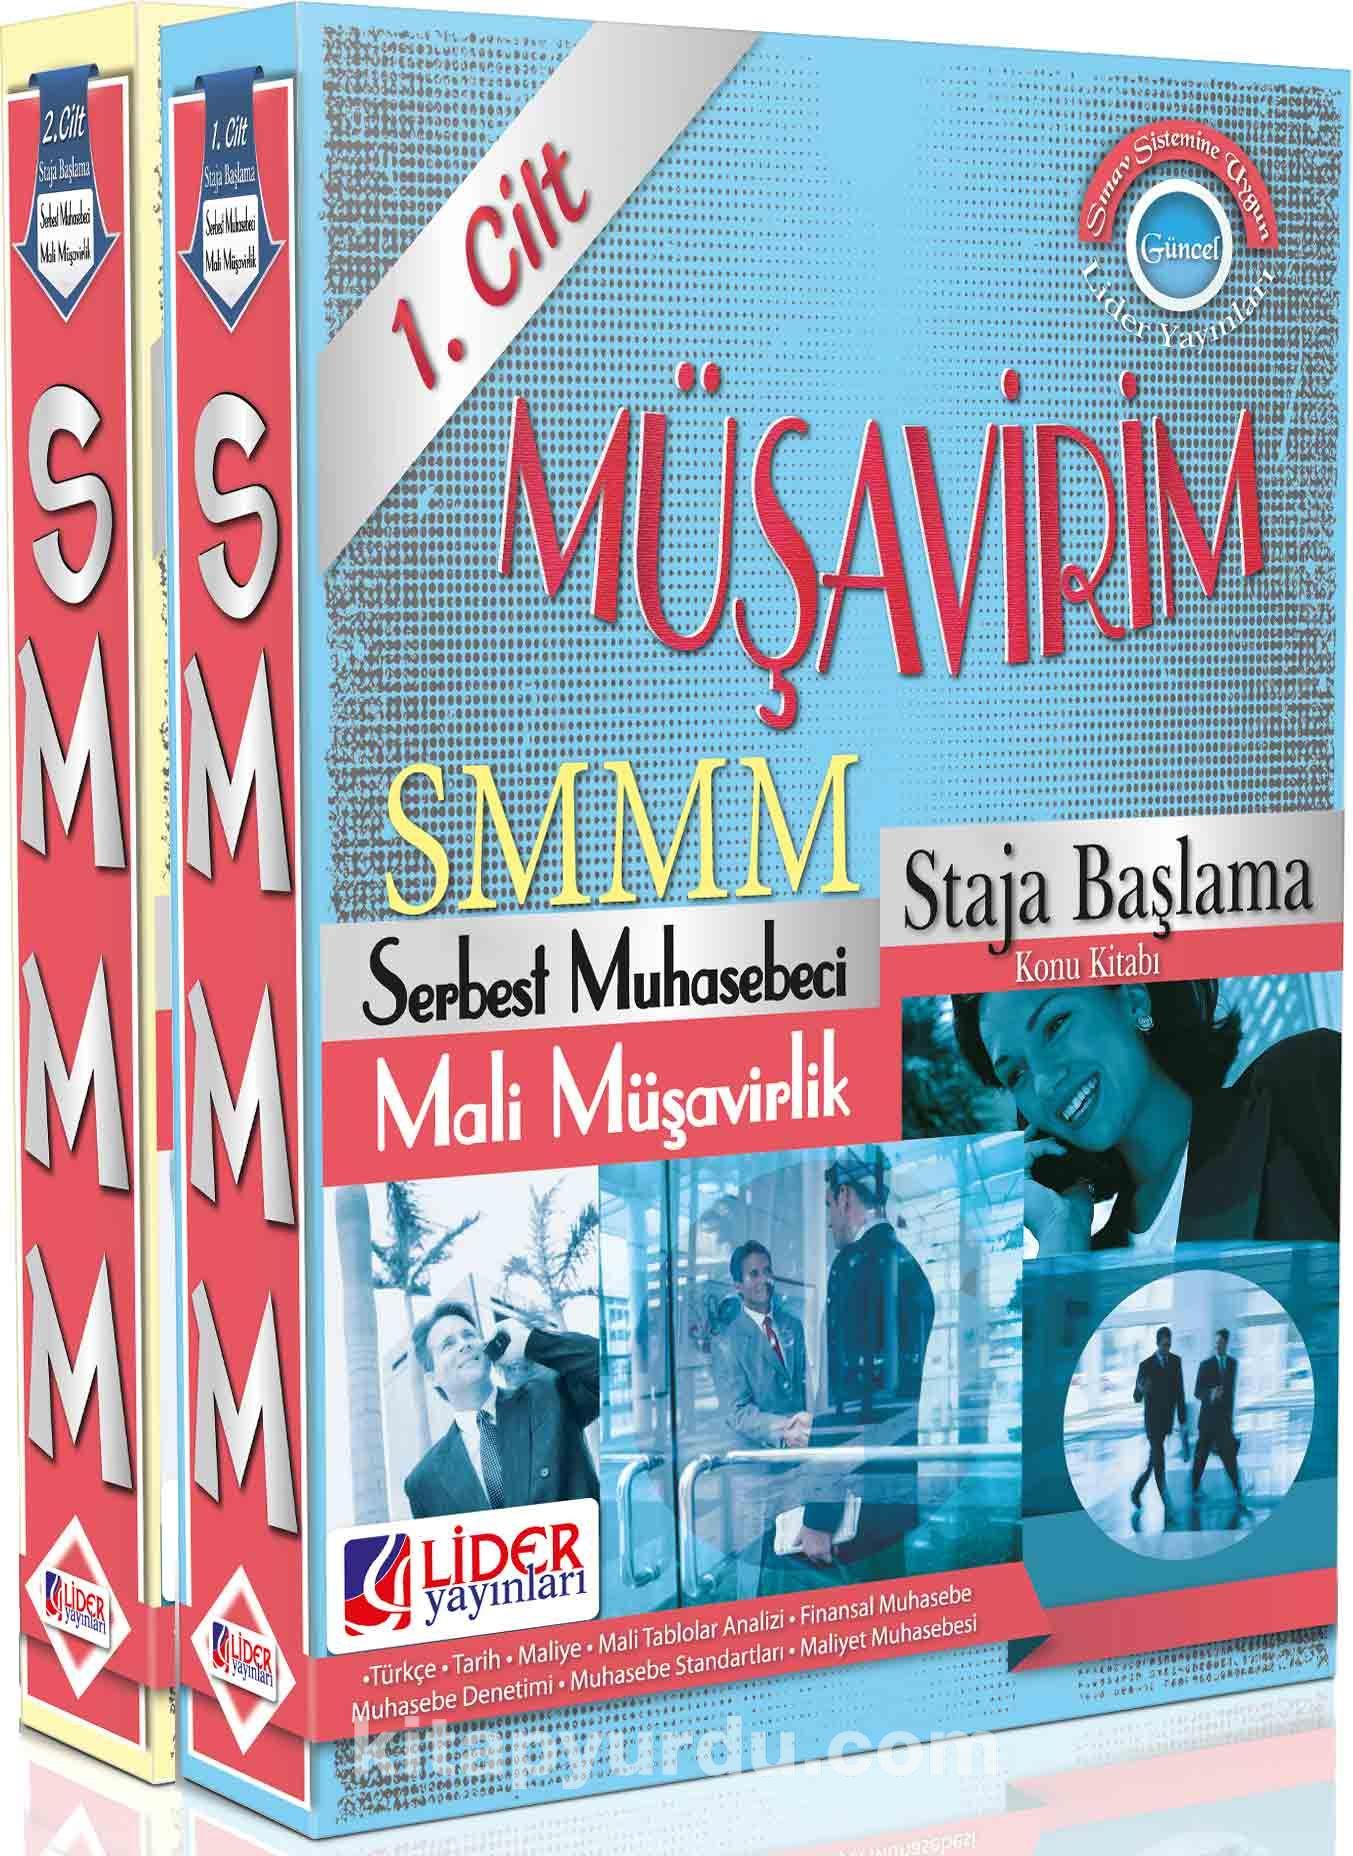 SMMM Staja Başlama Konu Kitabı (2 Kitap Takım)